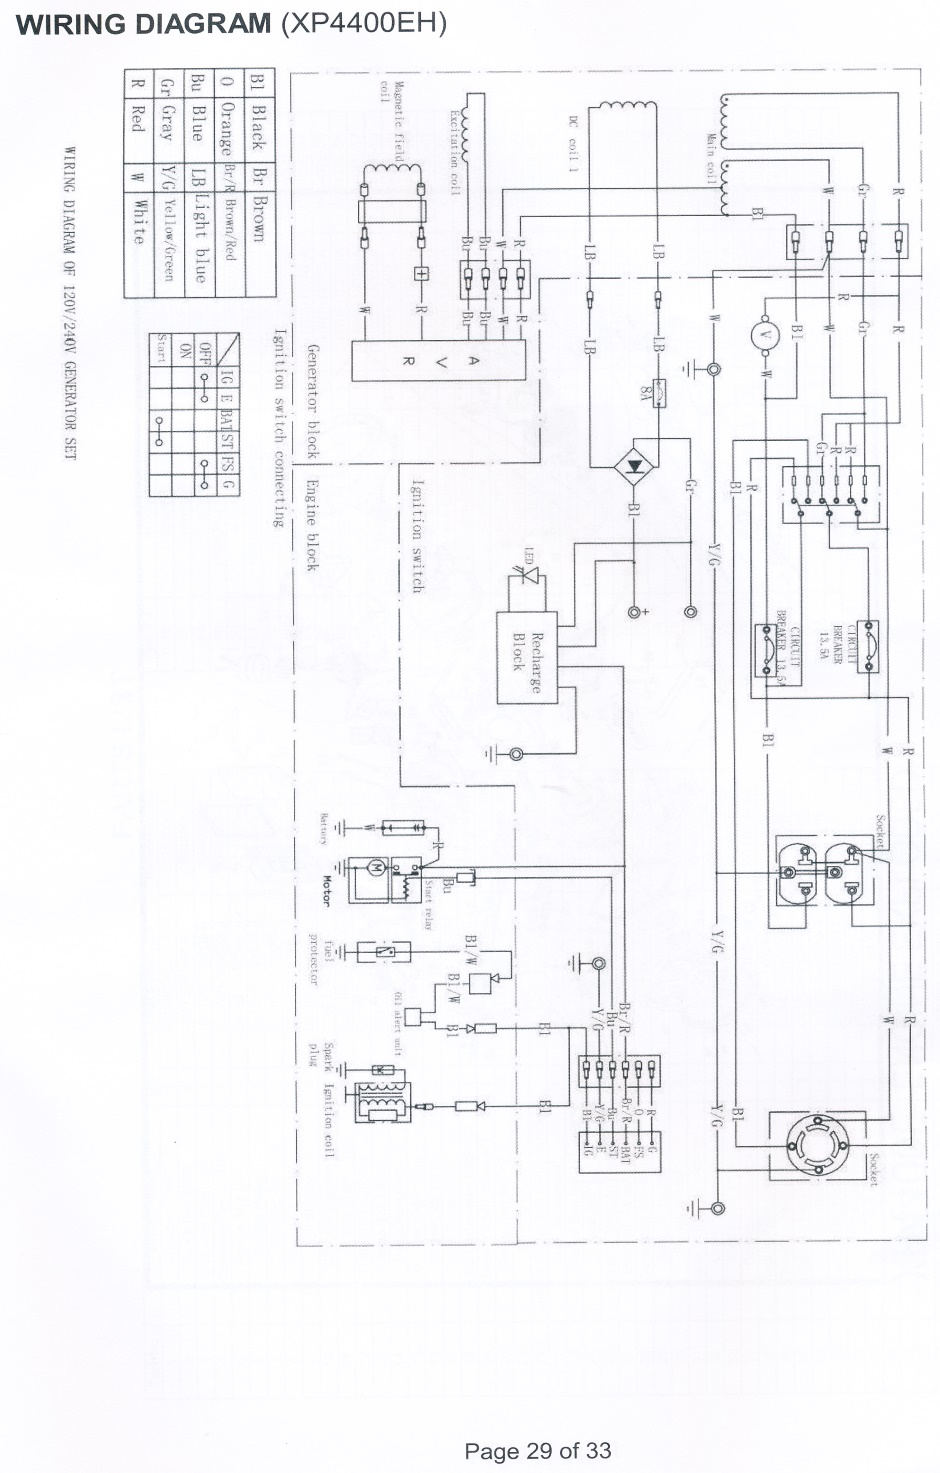 hight resolution of duromax generator wiring diagram wiring diagrams rh 89 treatchildtrauma de generator plug wiring diagram generator schematic diagram